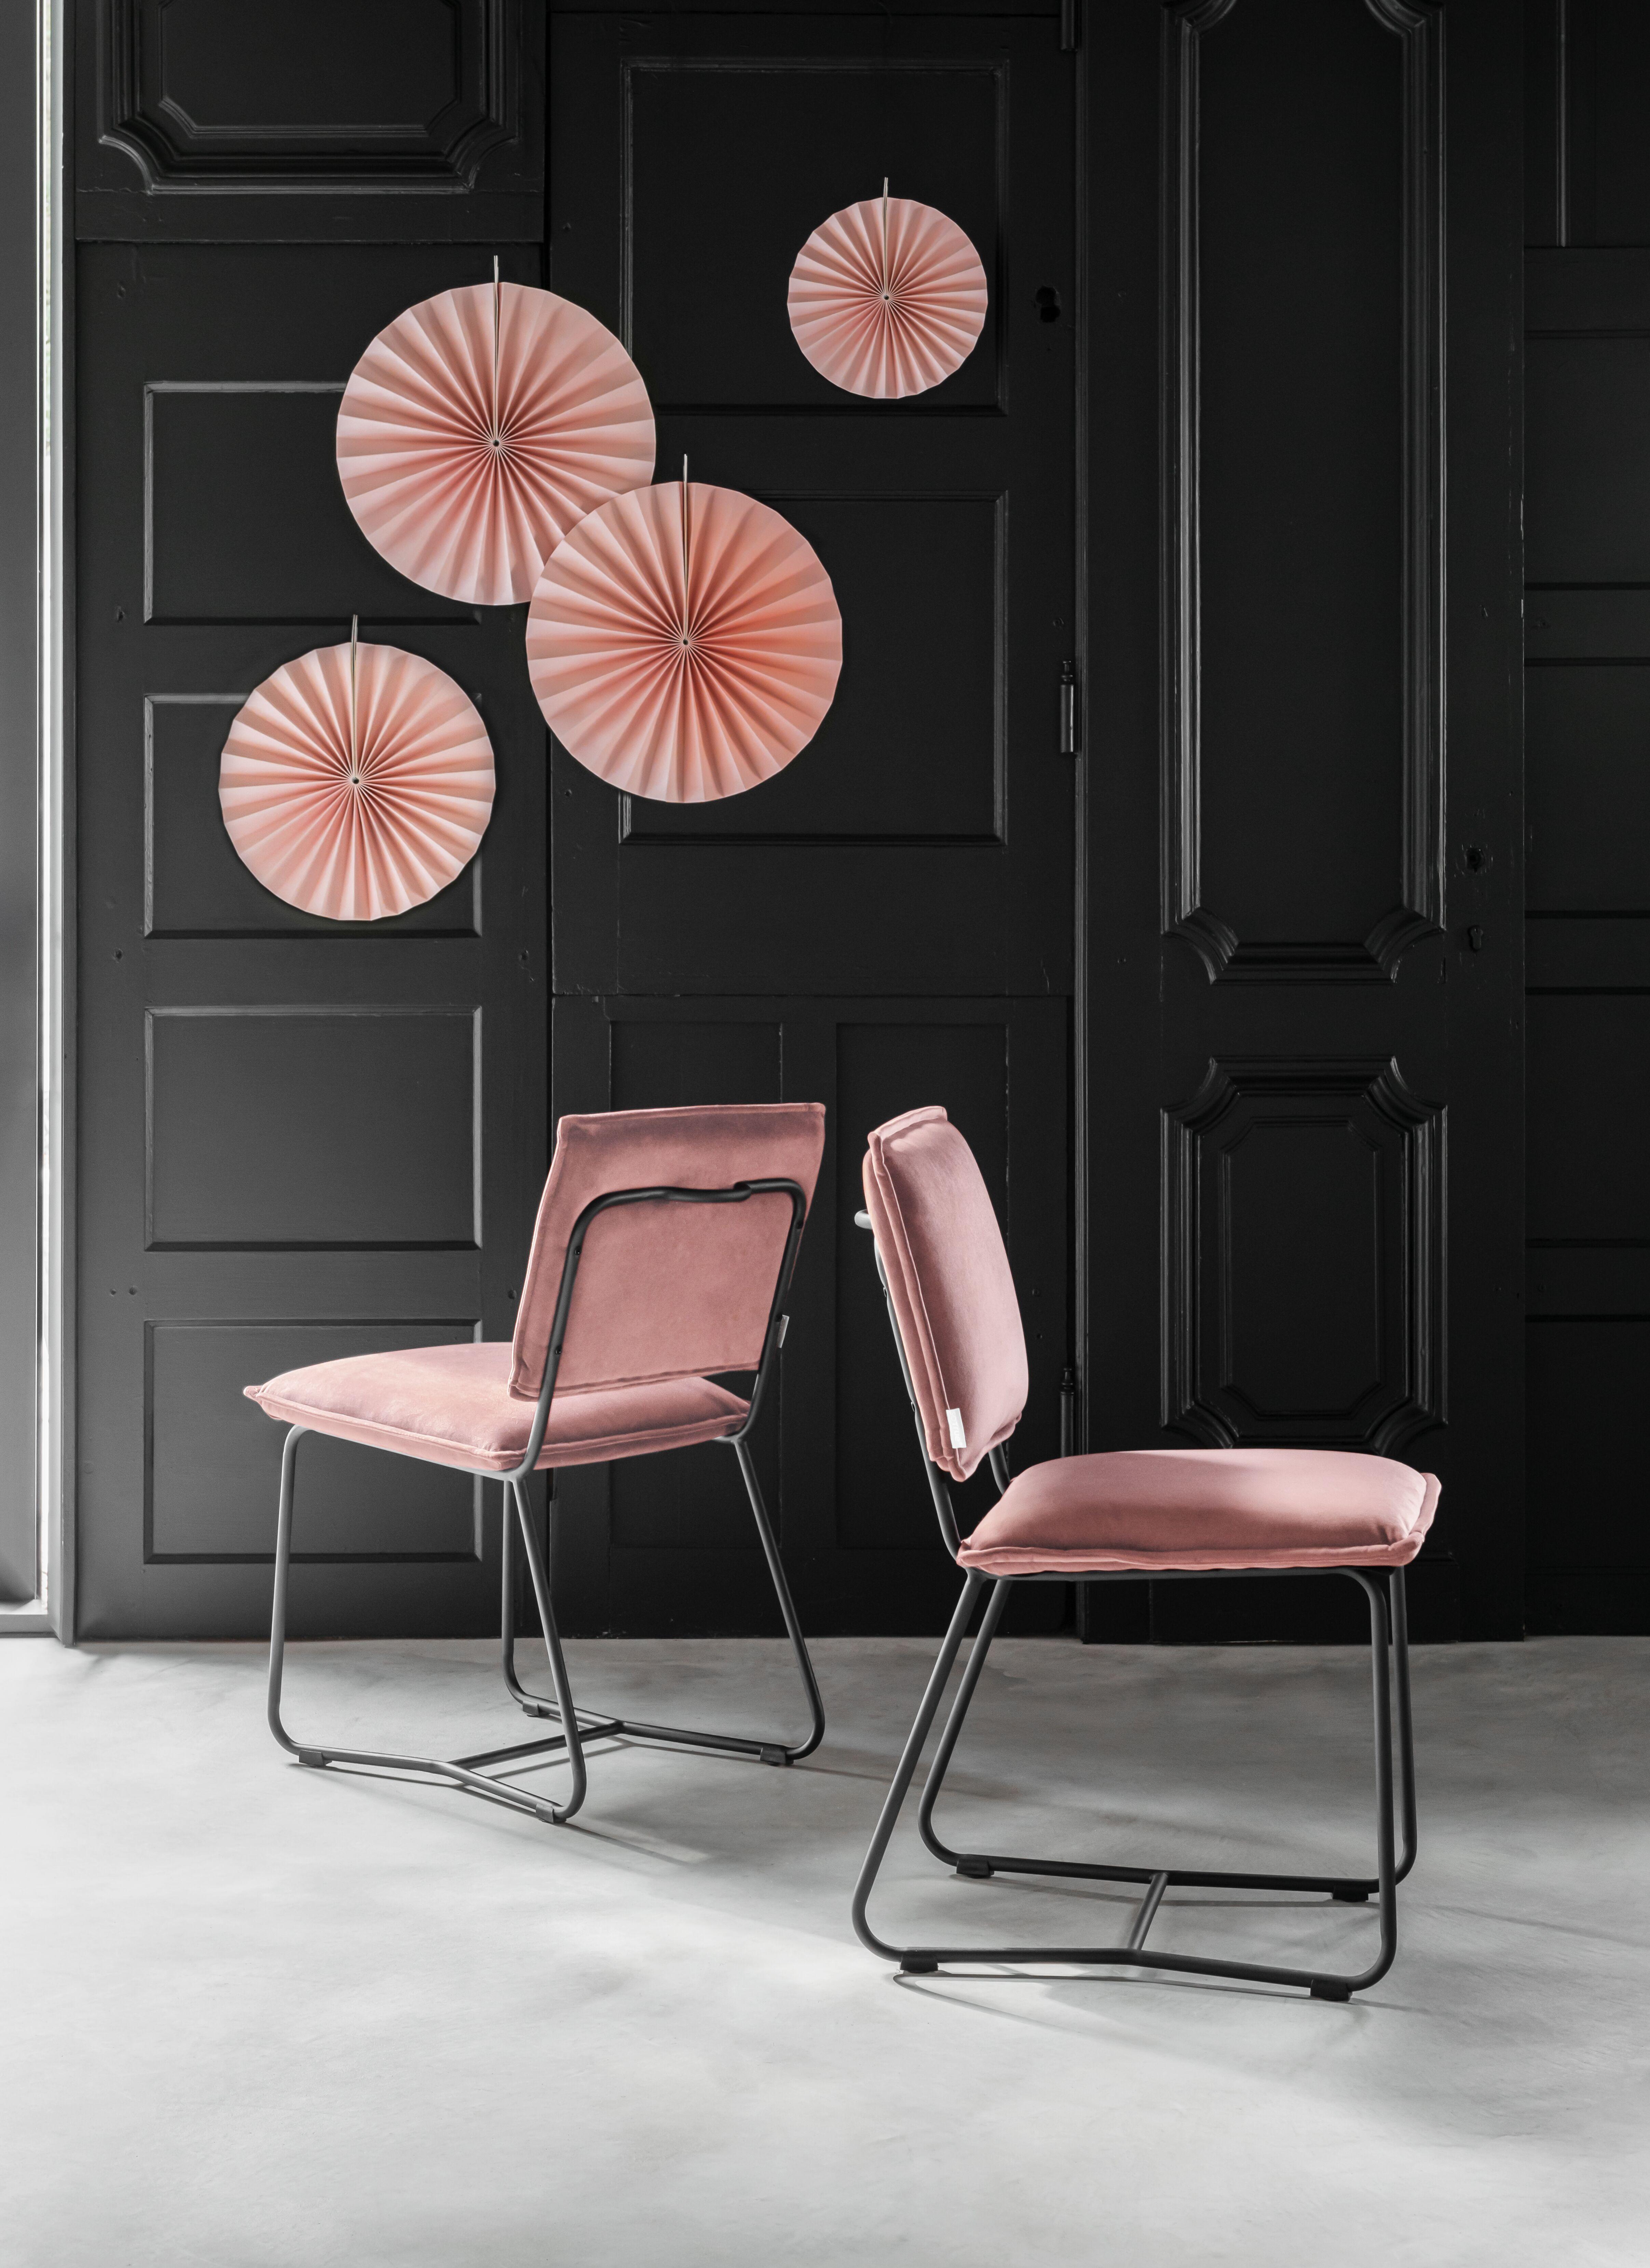 #interior4all #interior #detroubadour #interieurinspiratie #interiordesign #detroubadourinterieurs #mijntroubadourinterieur #photography #interieur #inspiration #furniture #interiorstyling #interior123 #velvet #velvetinterior